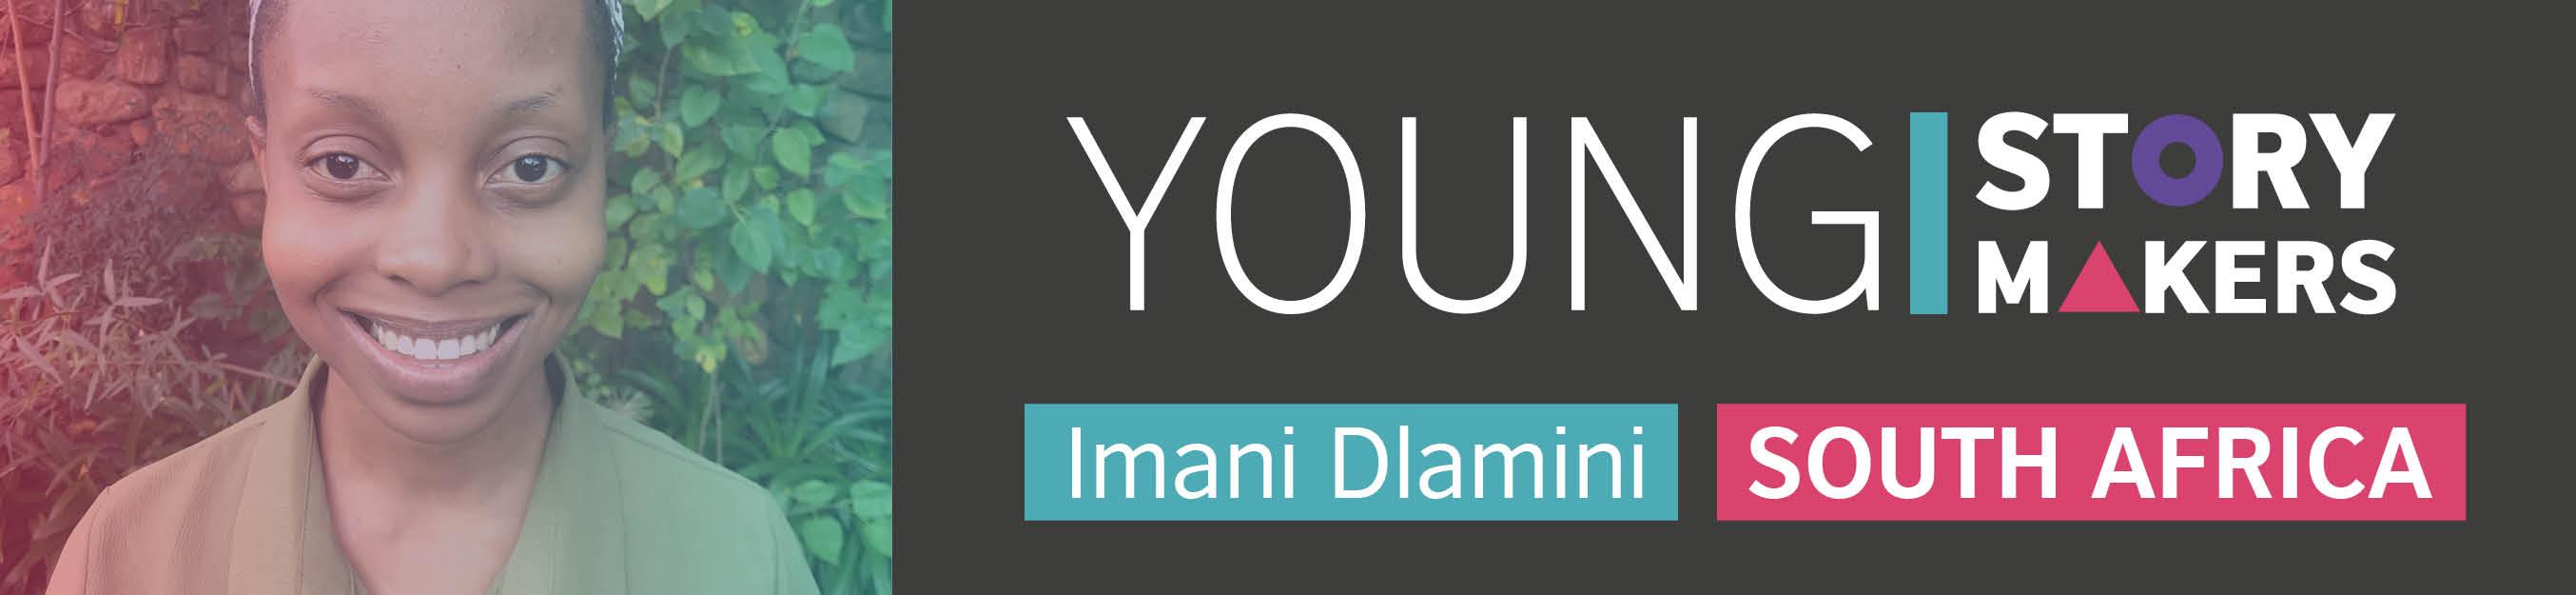 Imani Dlamini DICE Young Storymaker